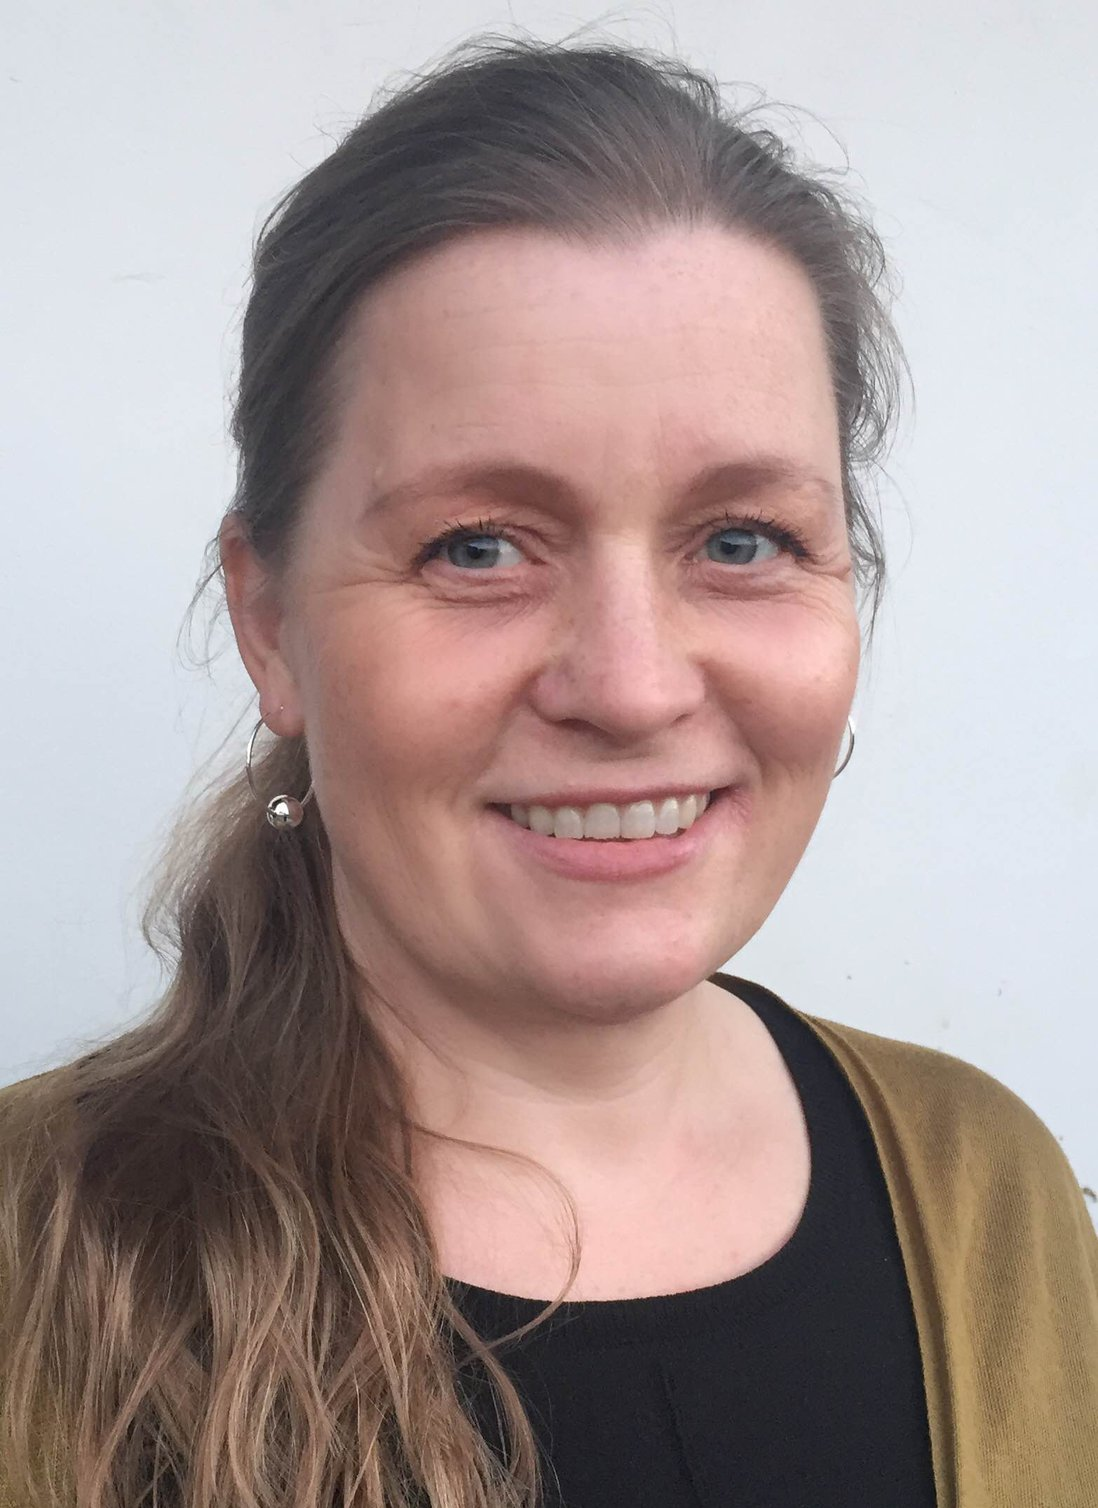 Kariann Krohne